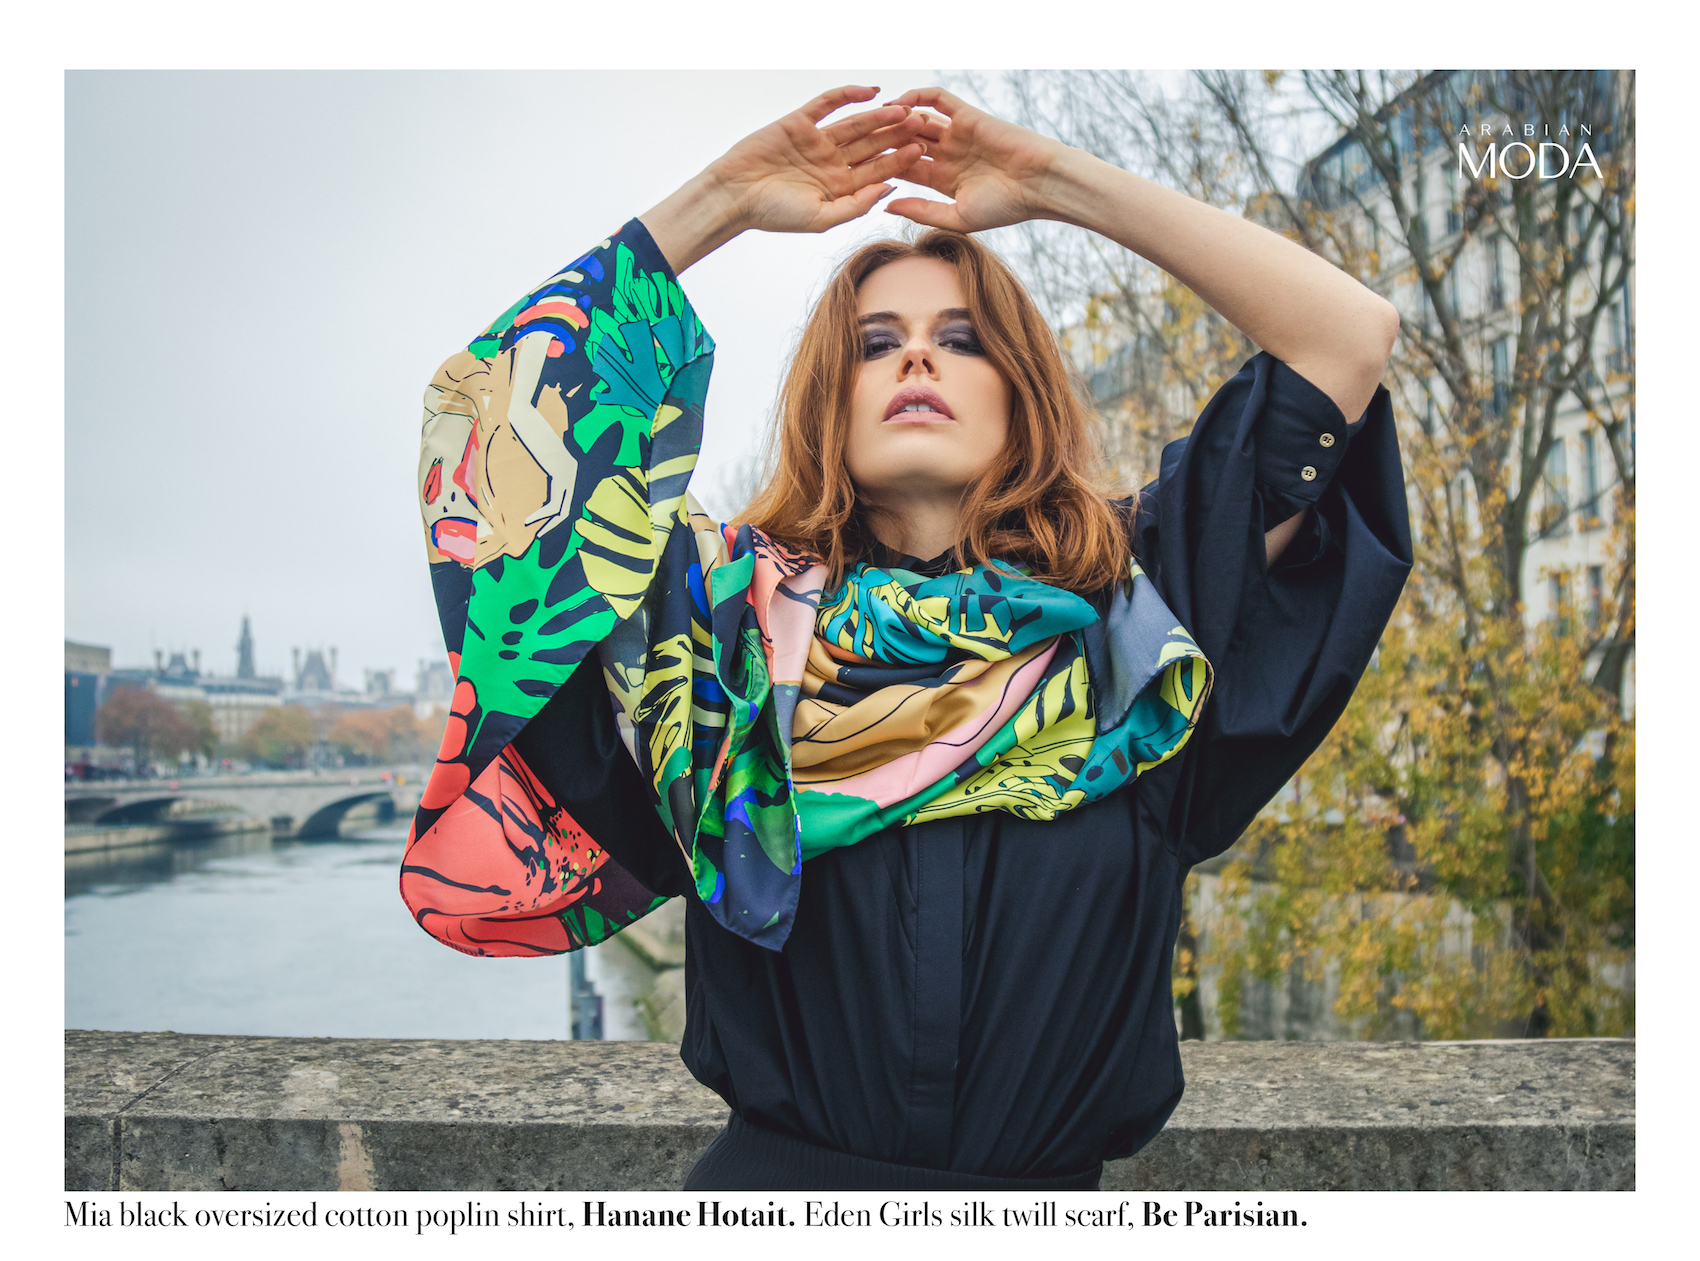 Arabian Moda x Be Parisian x Hanane Hotait-1